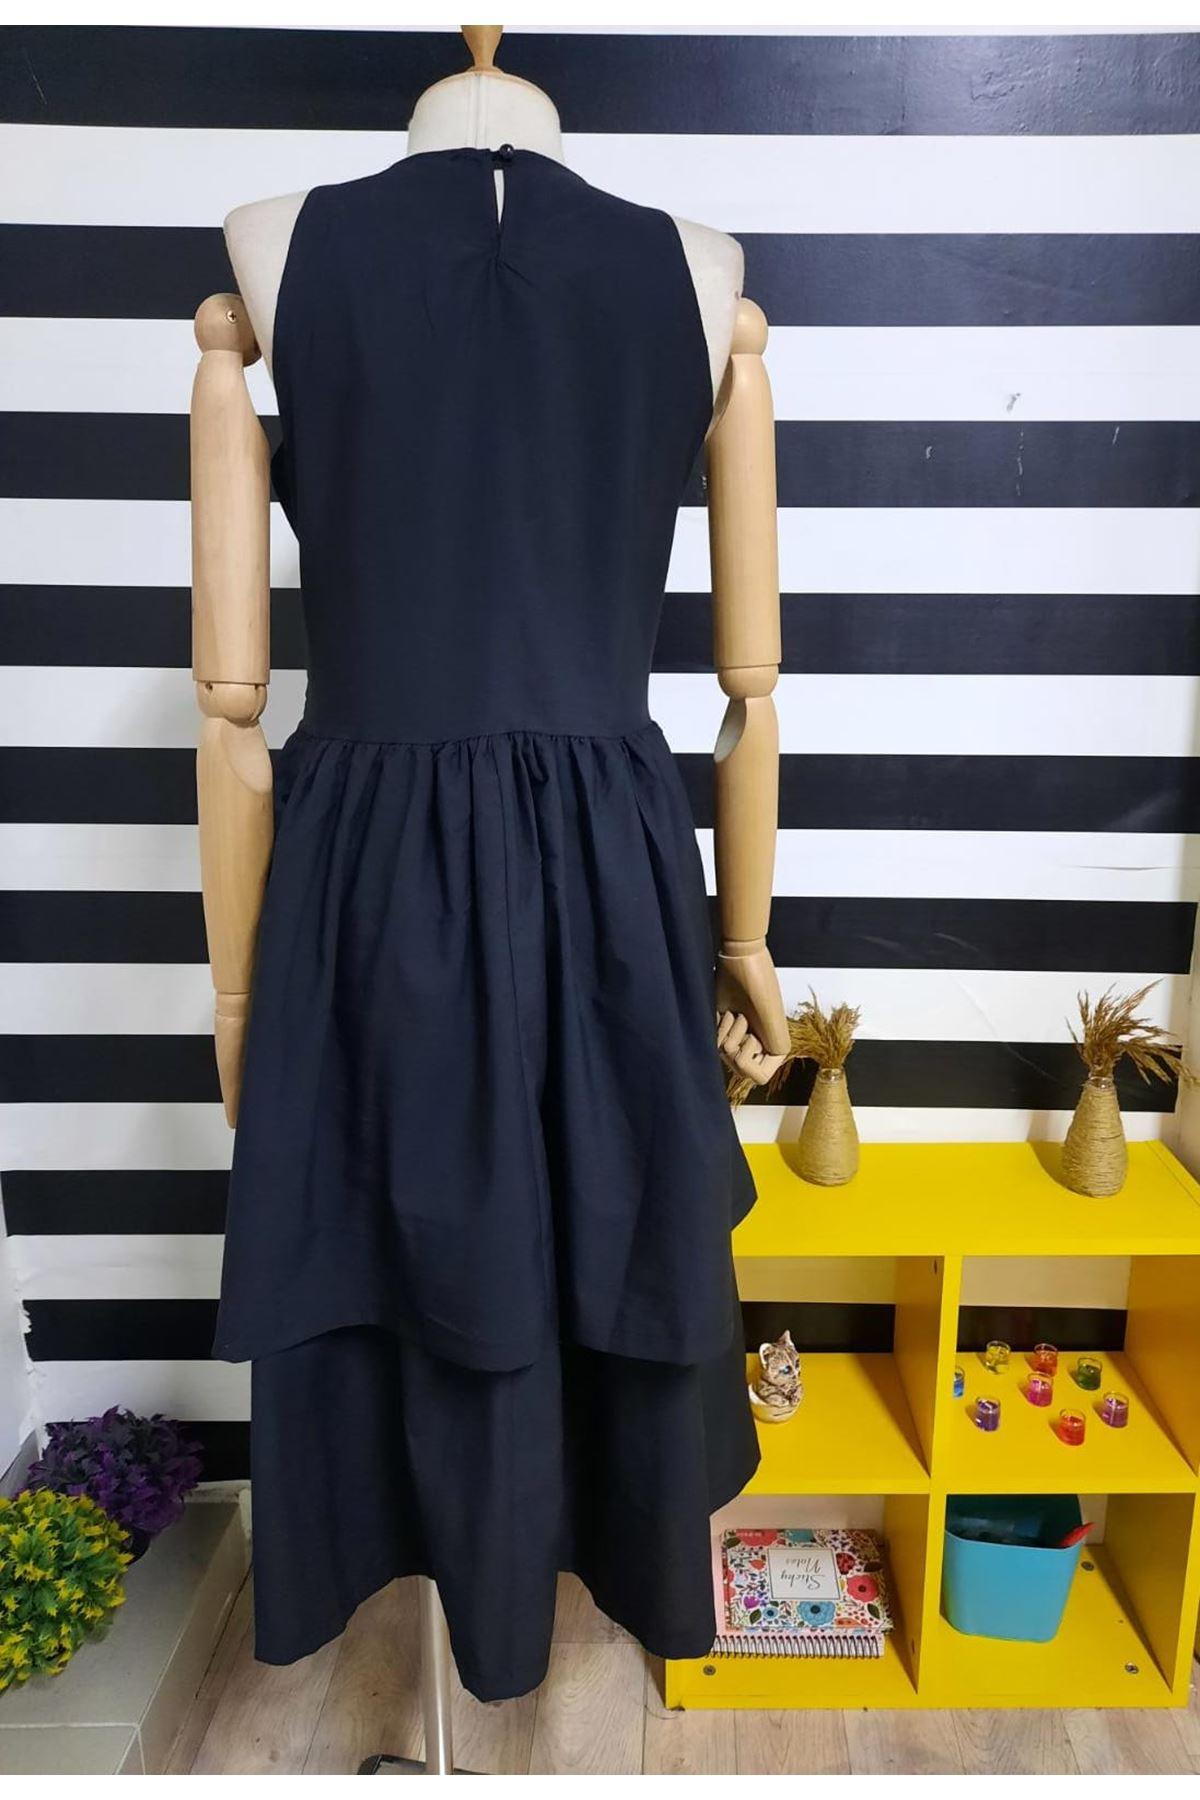 Sıfır Kol Trikoton Midiboy Elbise - SİYAH